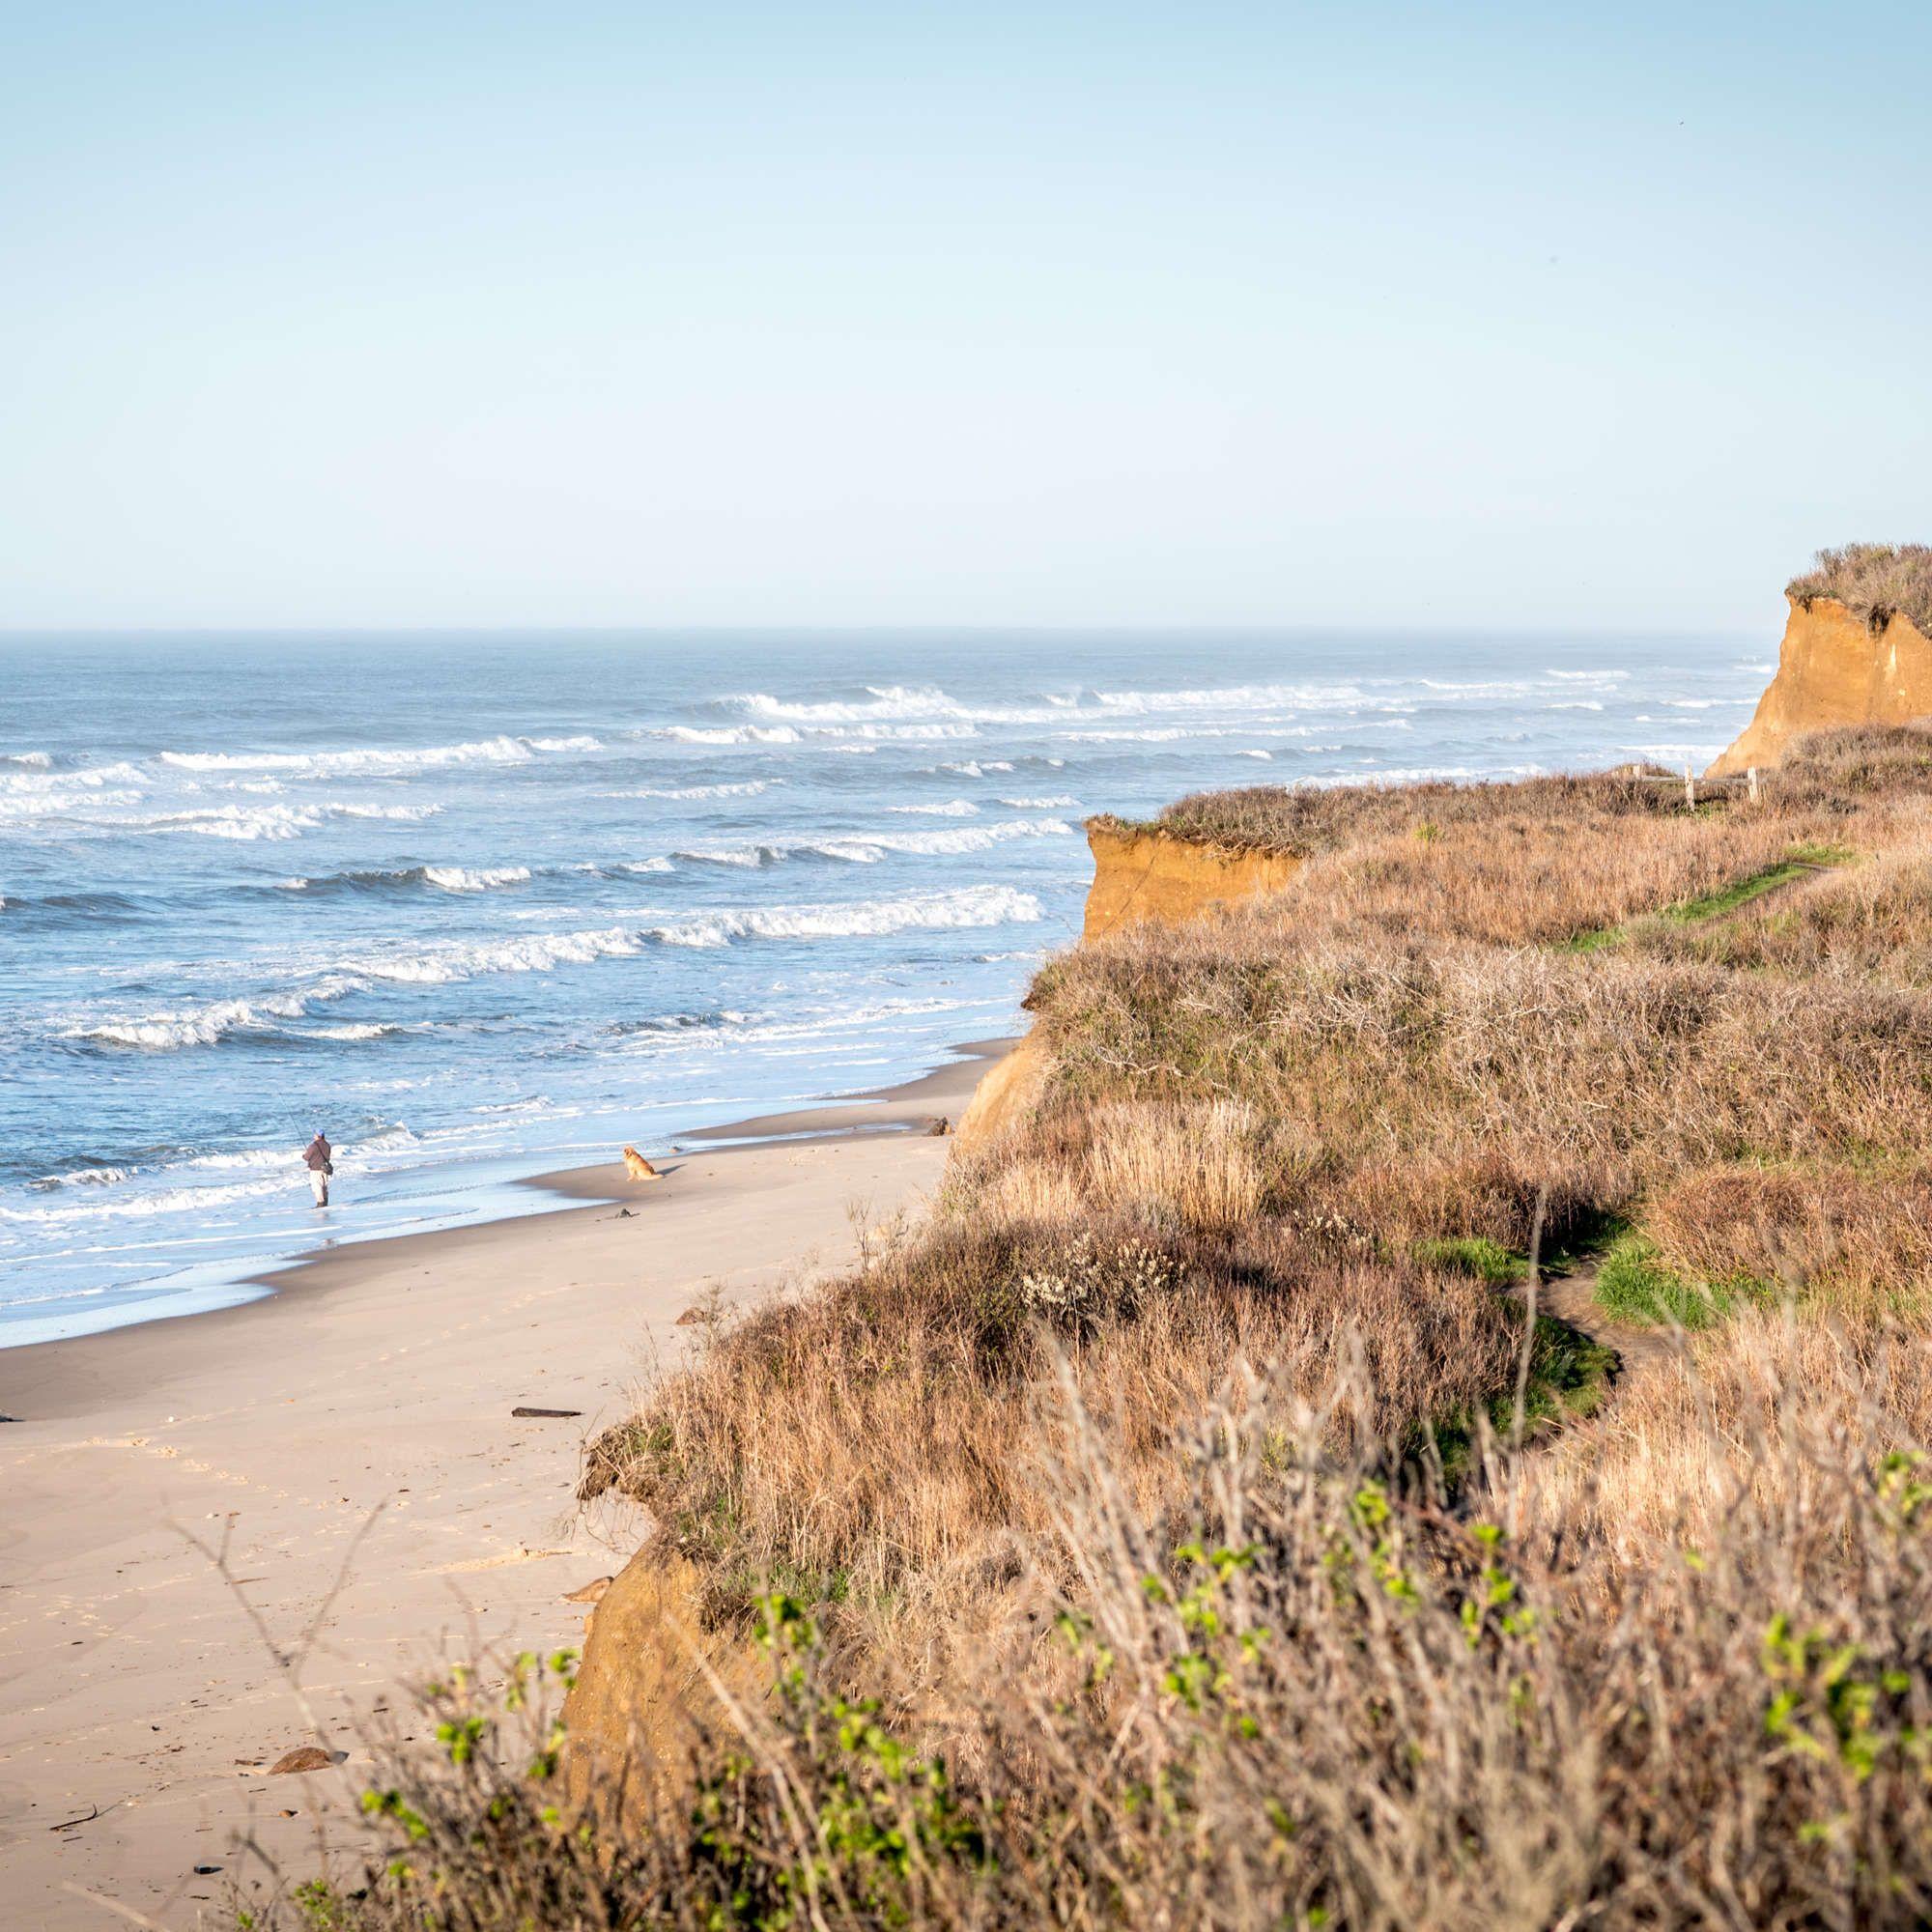 Desert Island Beach: The Best Beaches On Long Island